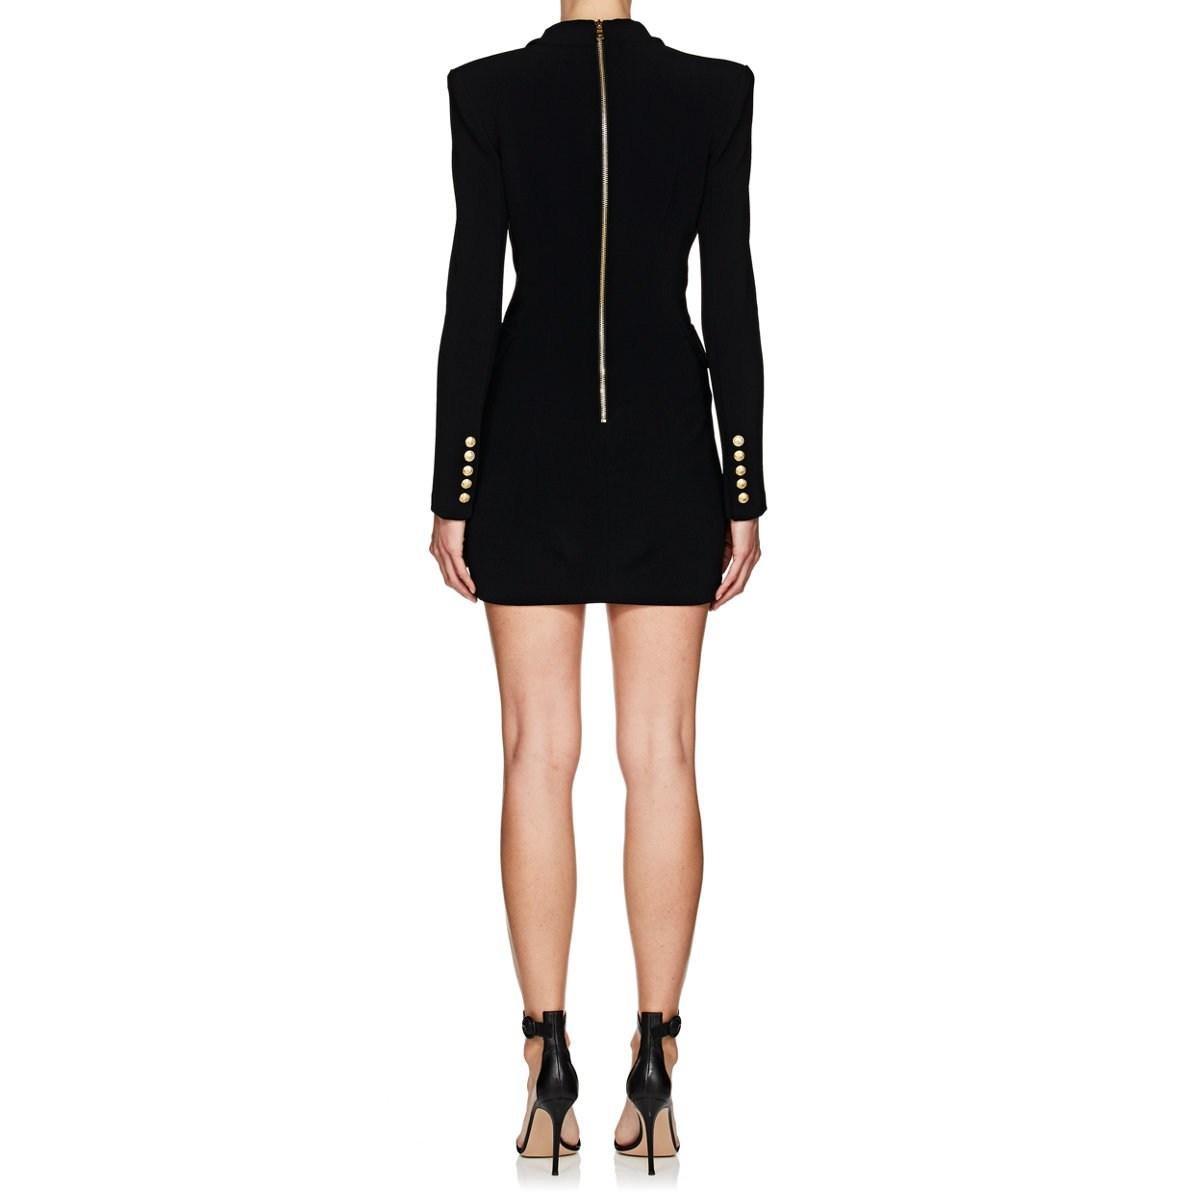 0334b8f4fc83 Balmain Tuxedo-inspired Crepe Dress in Black - Lyst